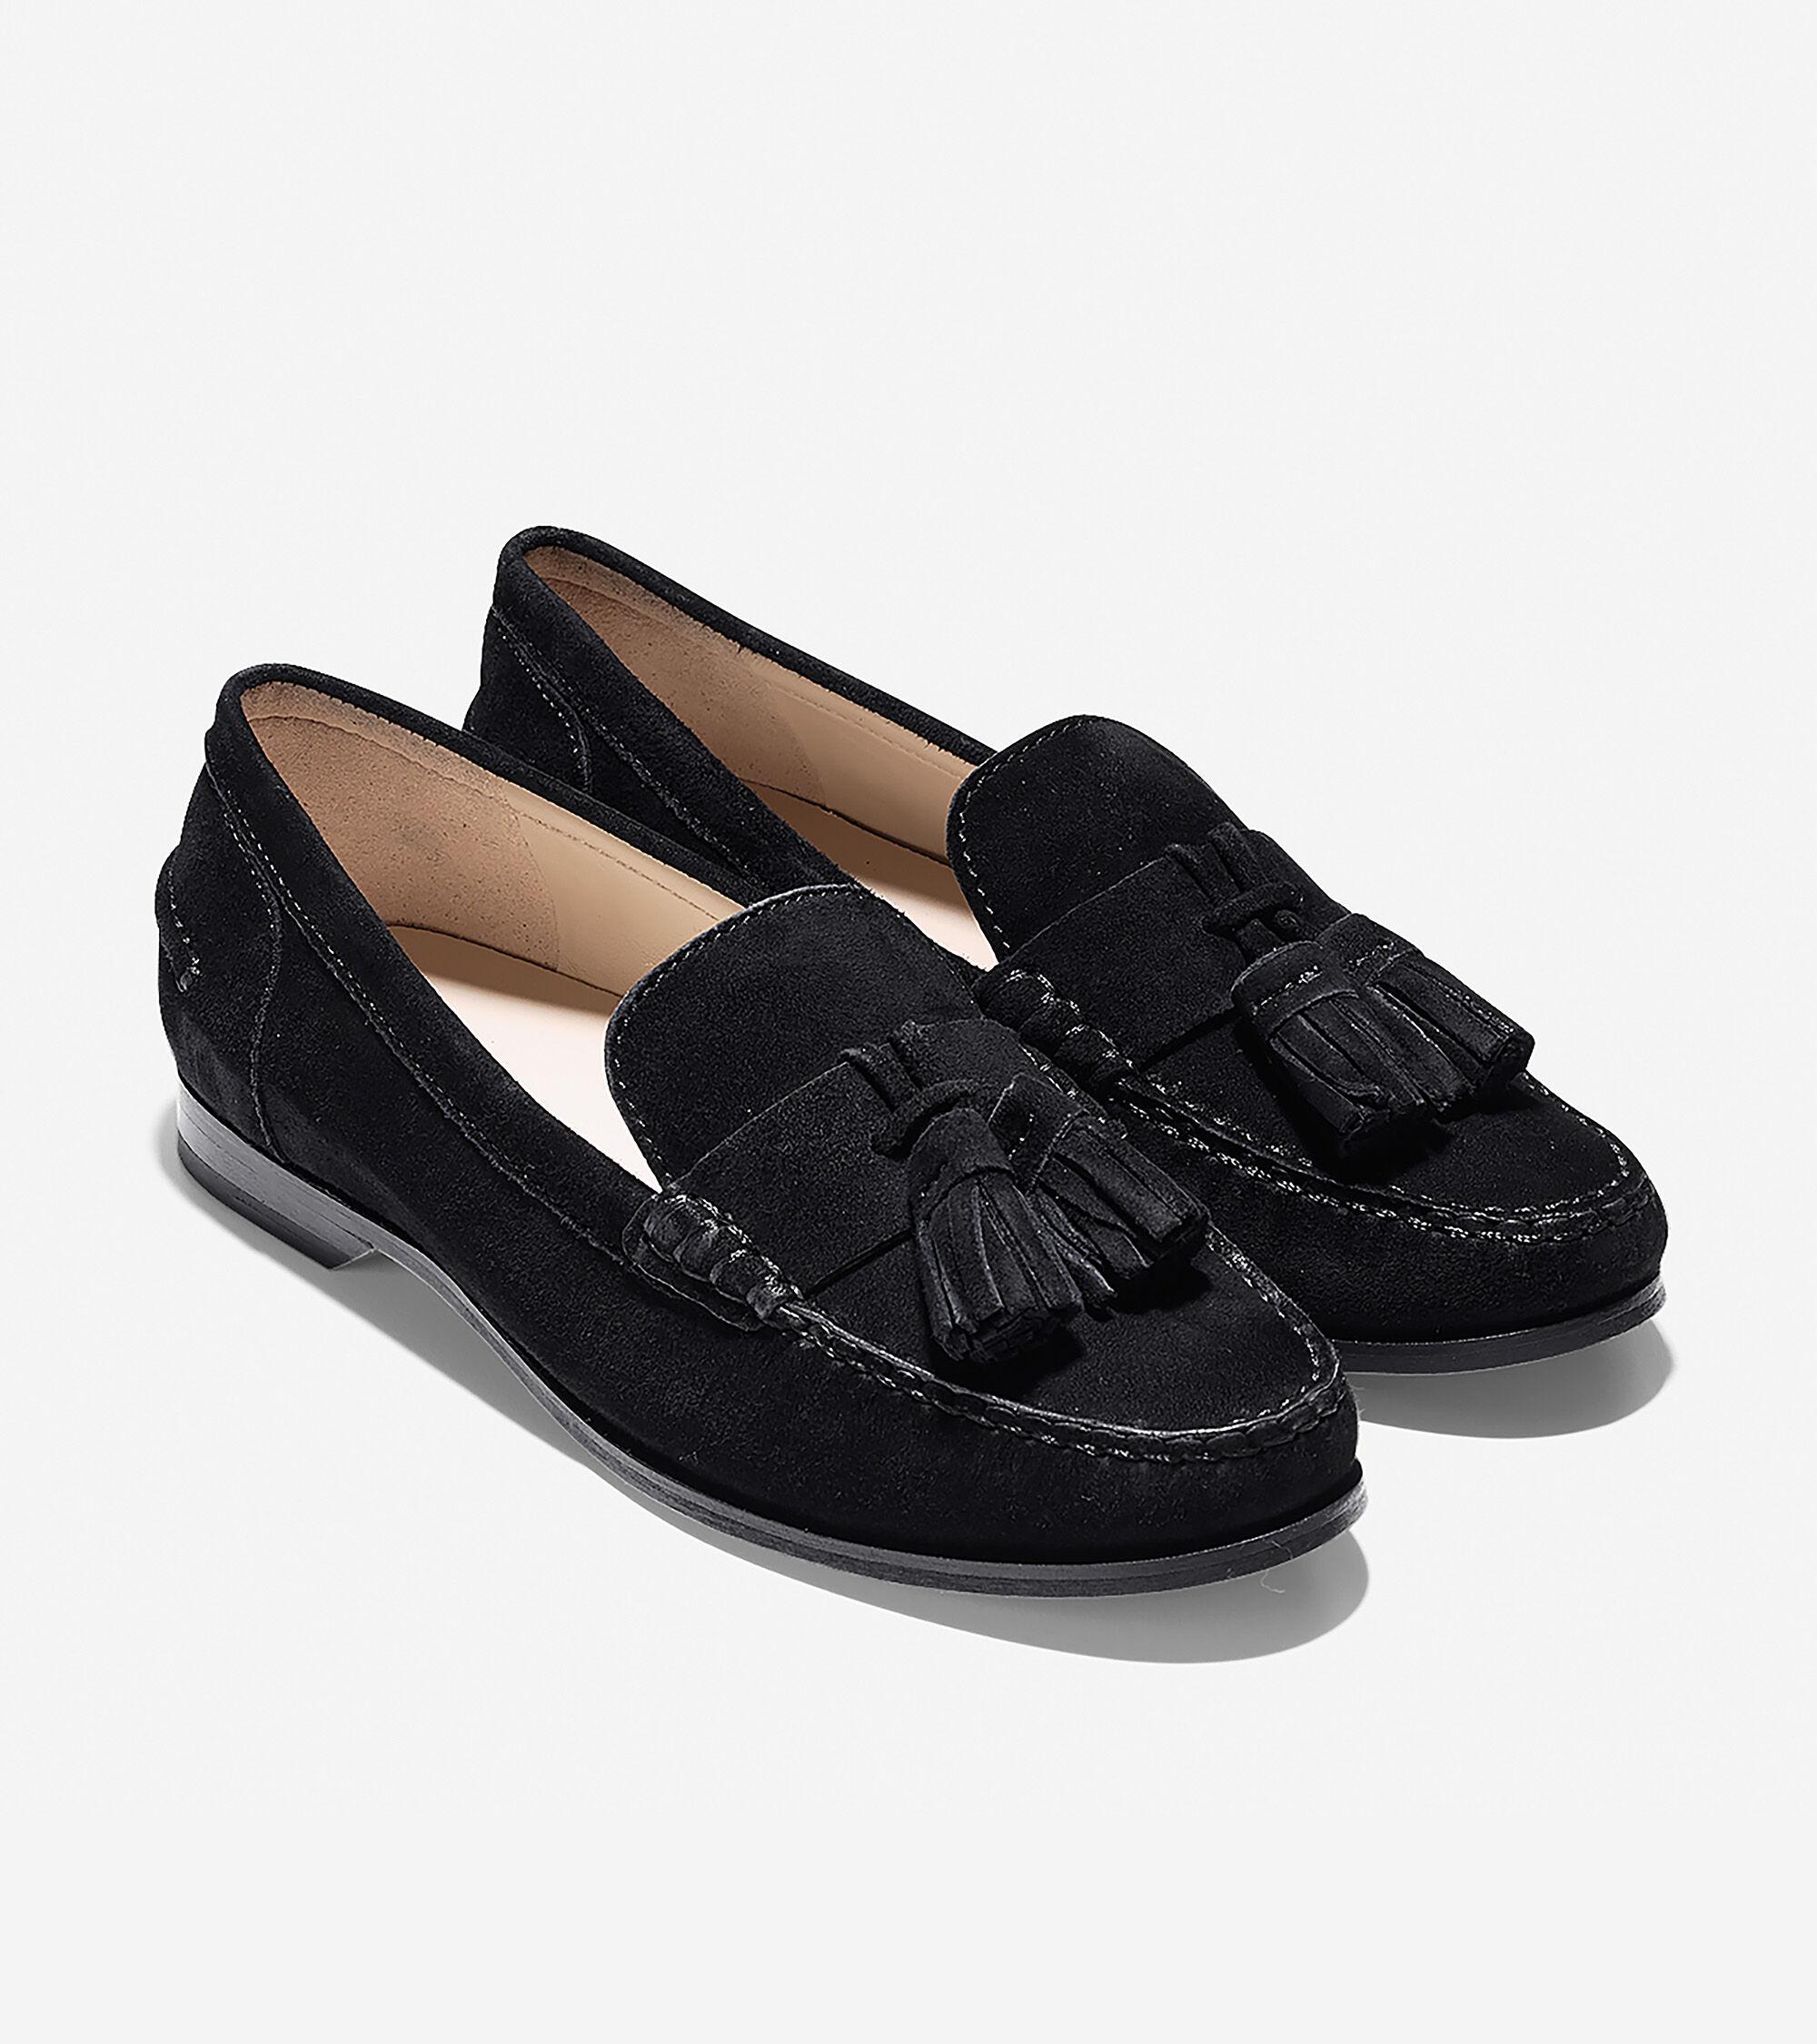 cole haan black tassel loafers